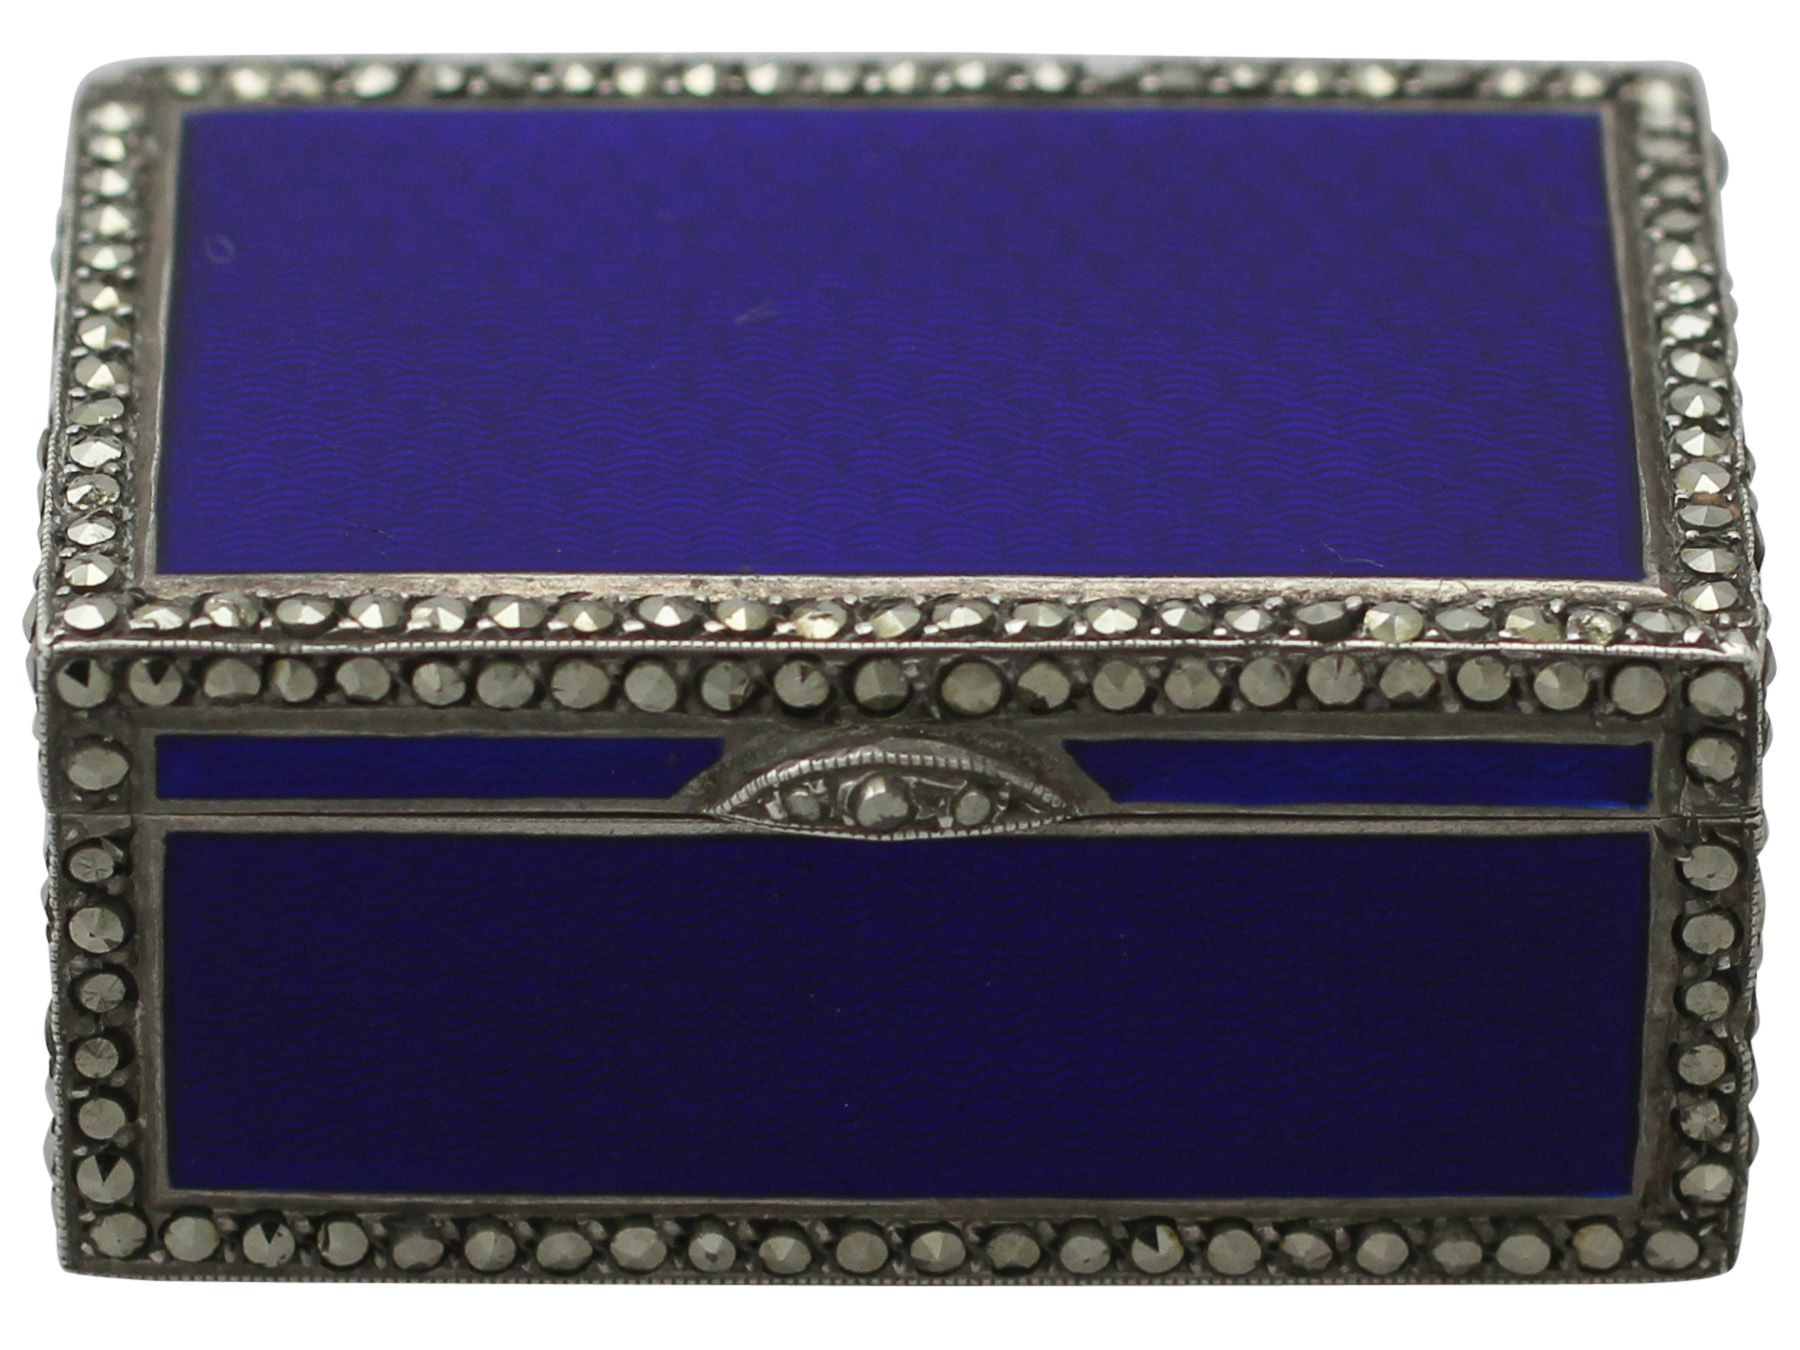 History of Music Box